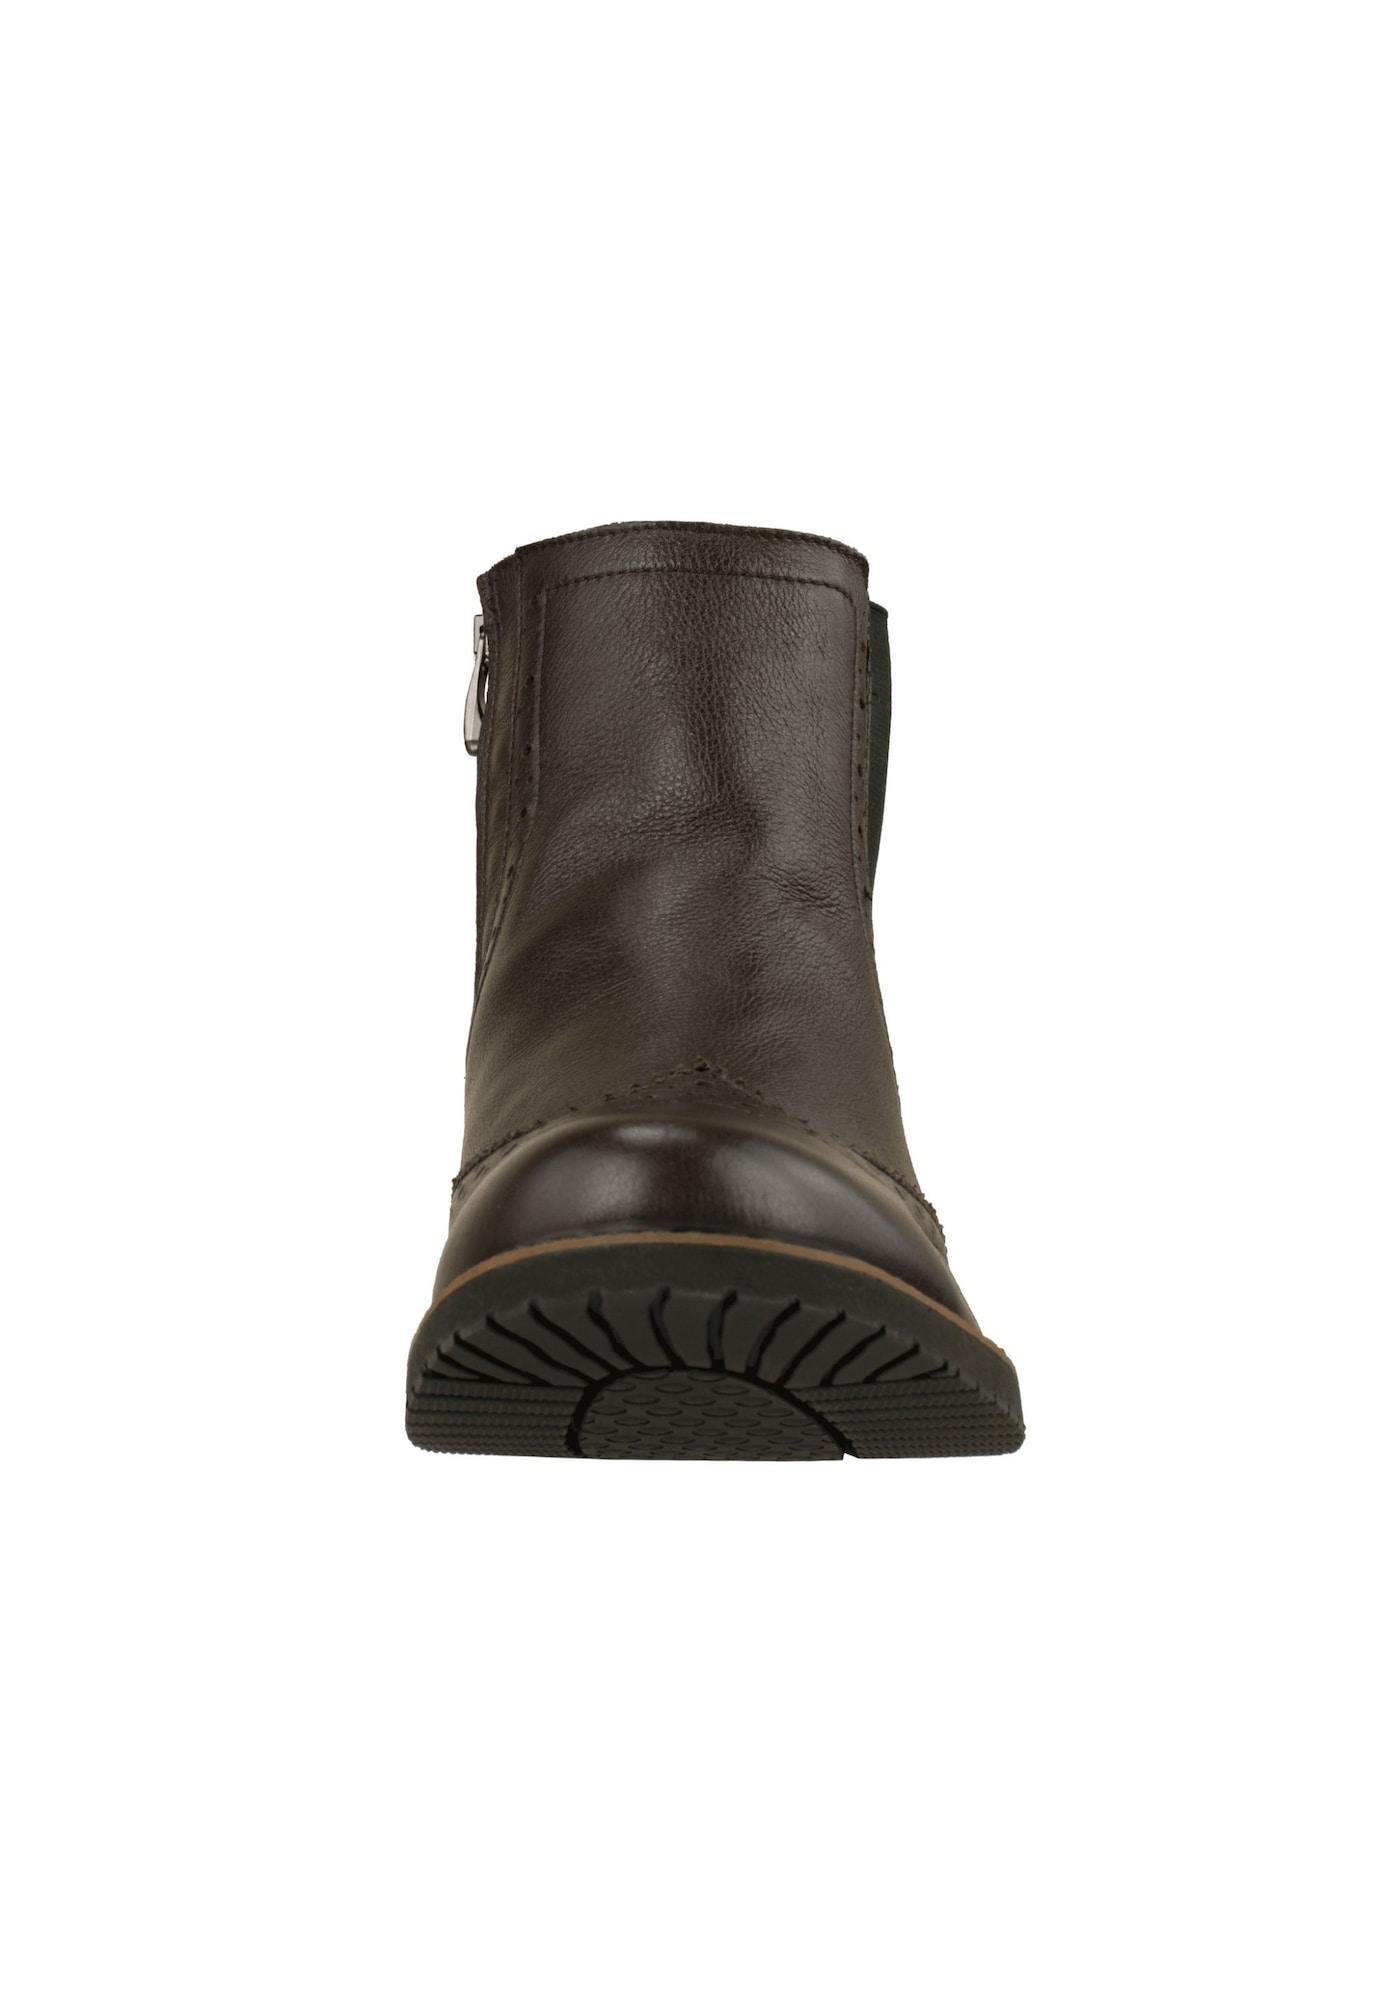 Chelsea boots 'Filippo' Lui by tessamino